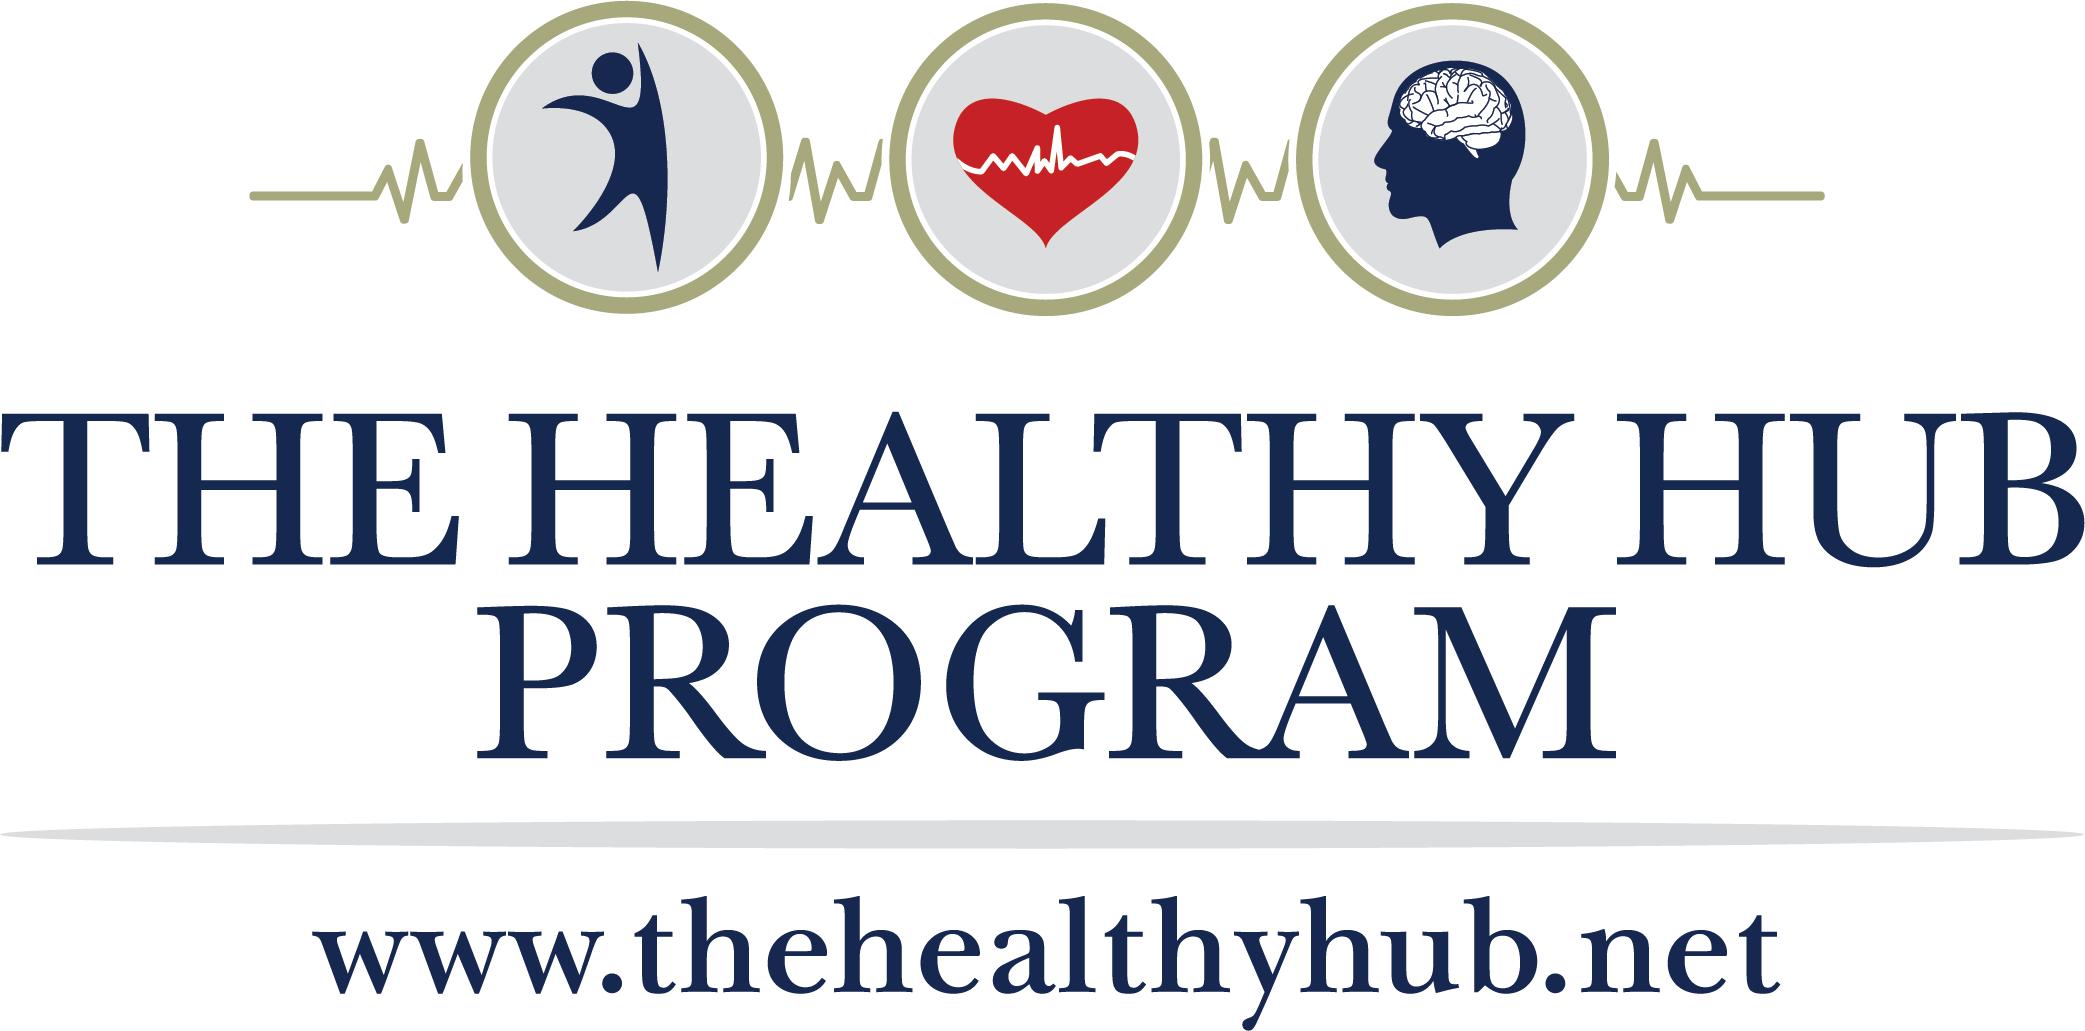 The Healthy Hub Program - Lifestyle Change.